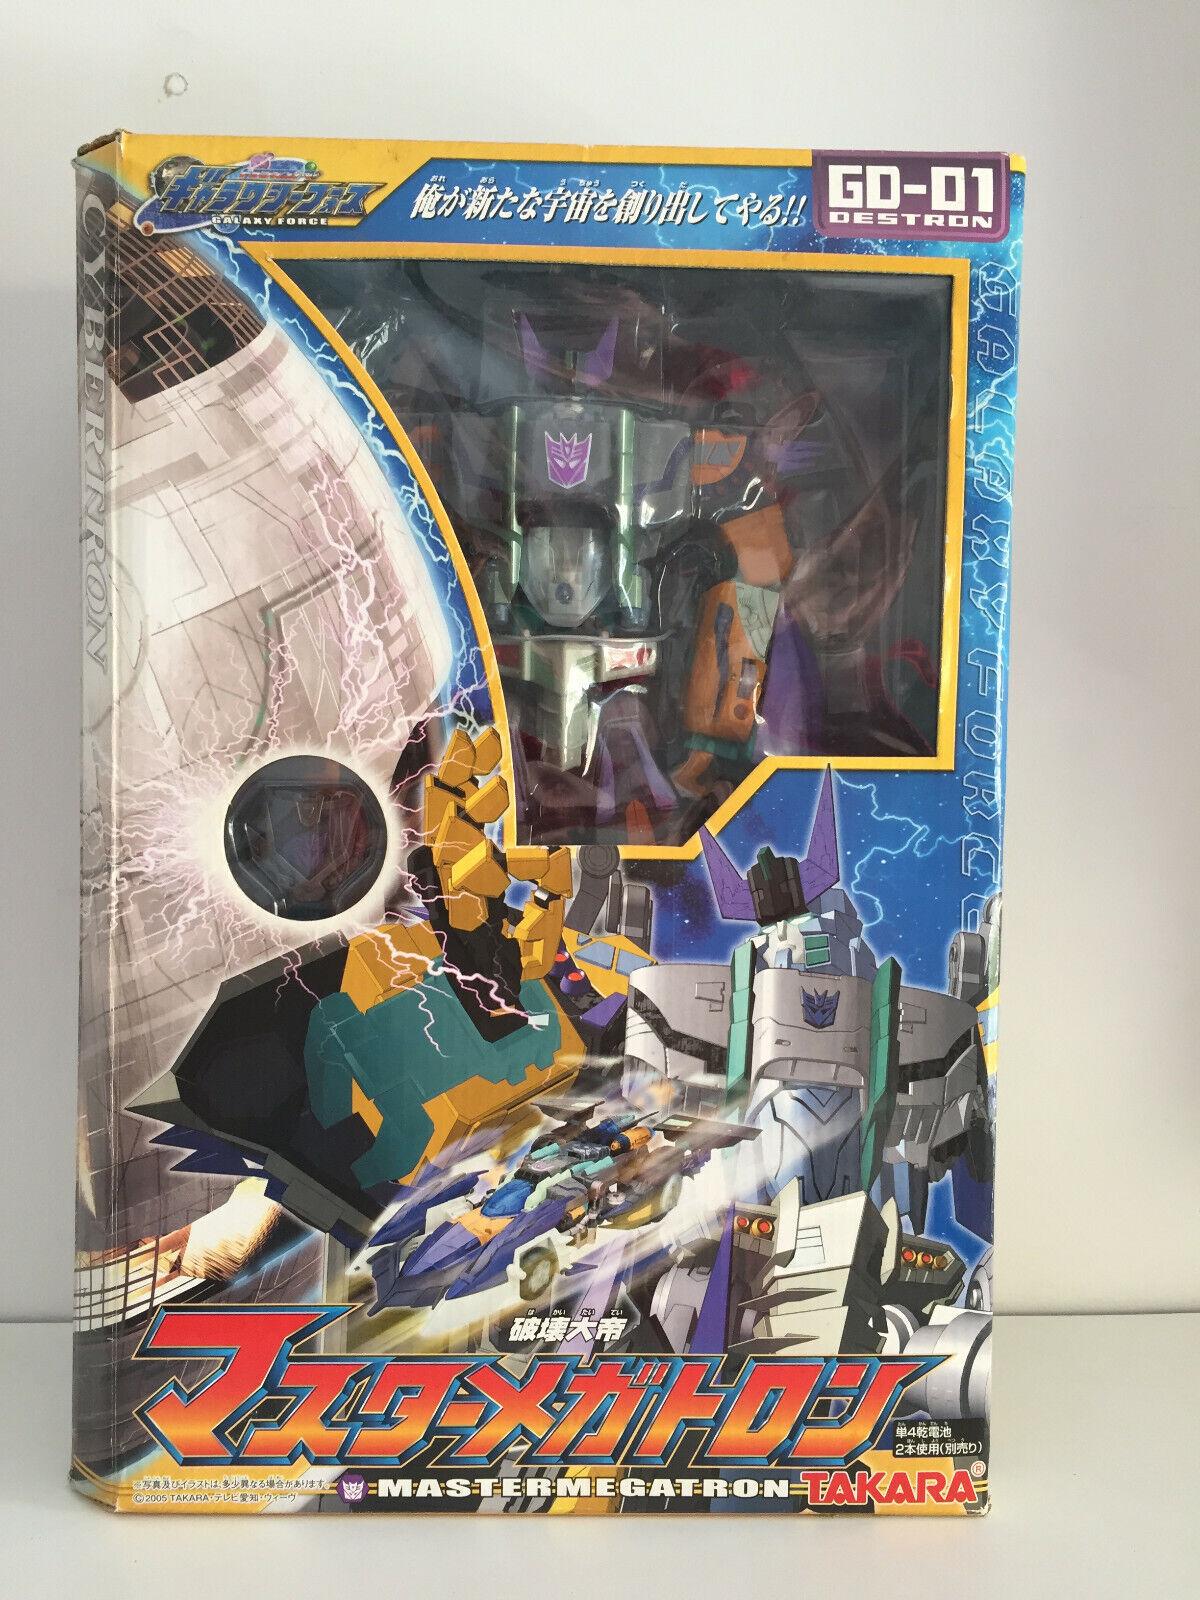 Takara Transformers Galaxy Force GD-01 Master Megatron